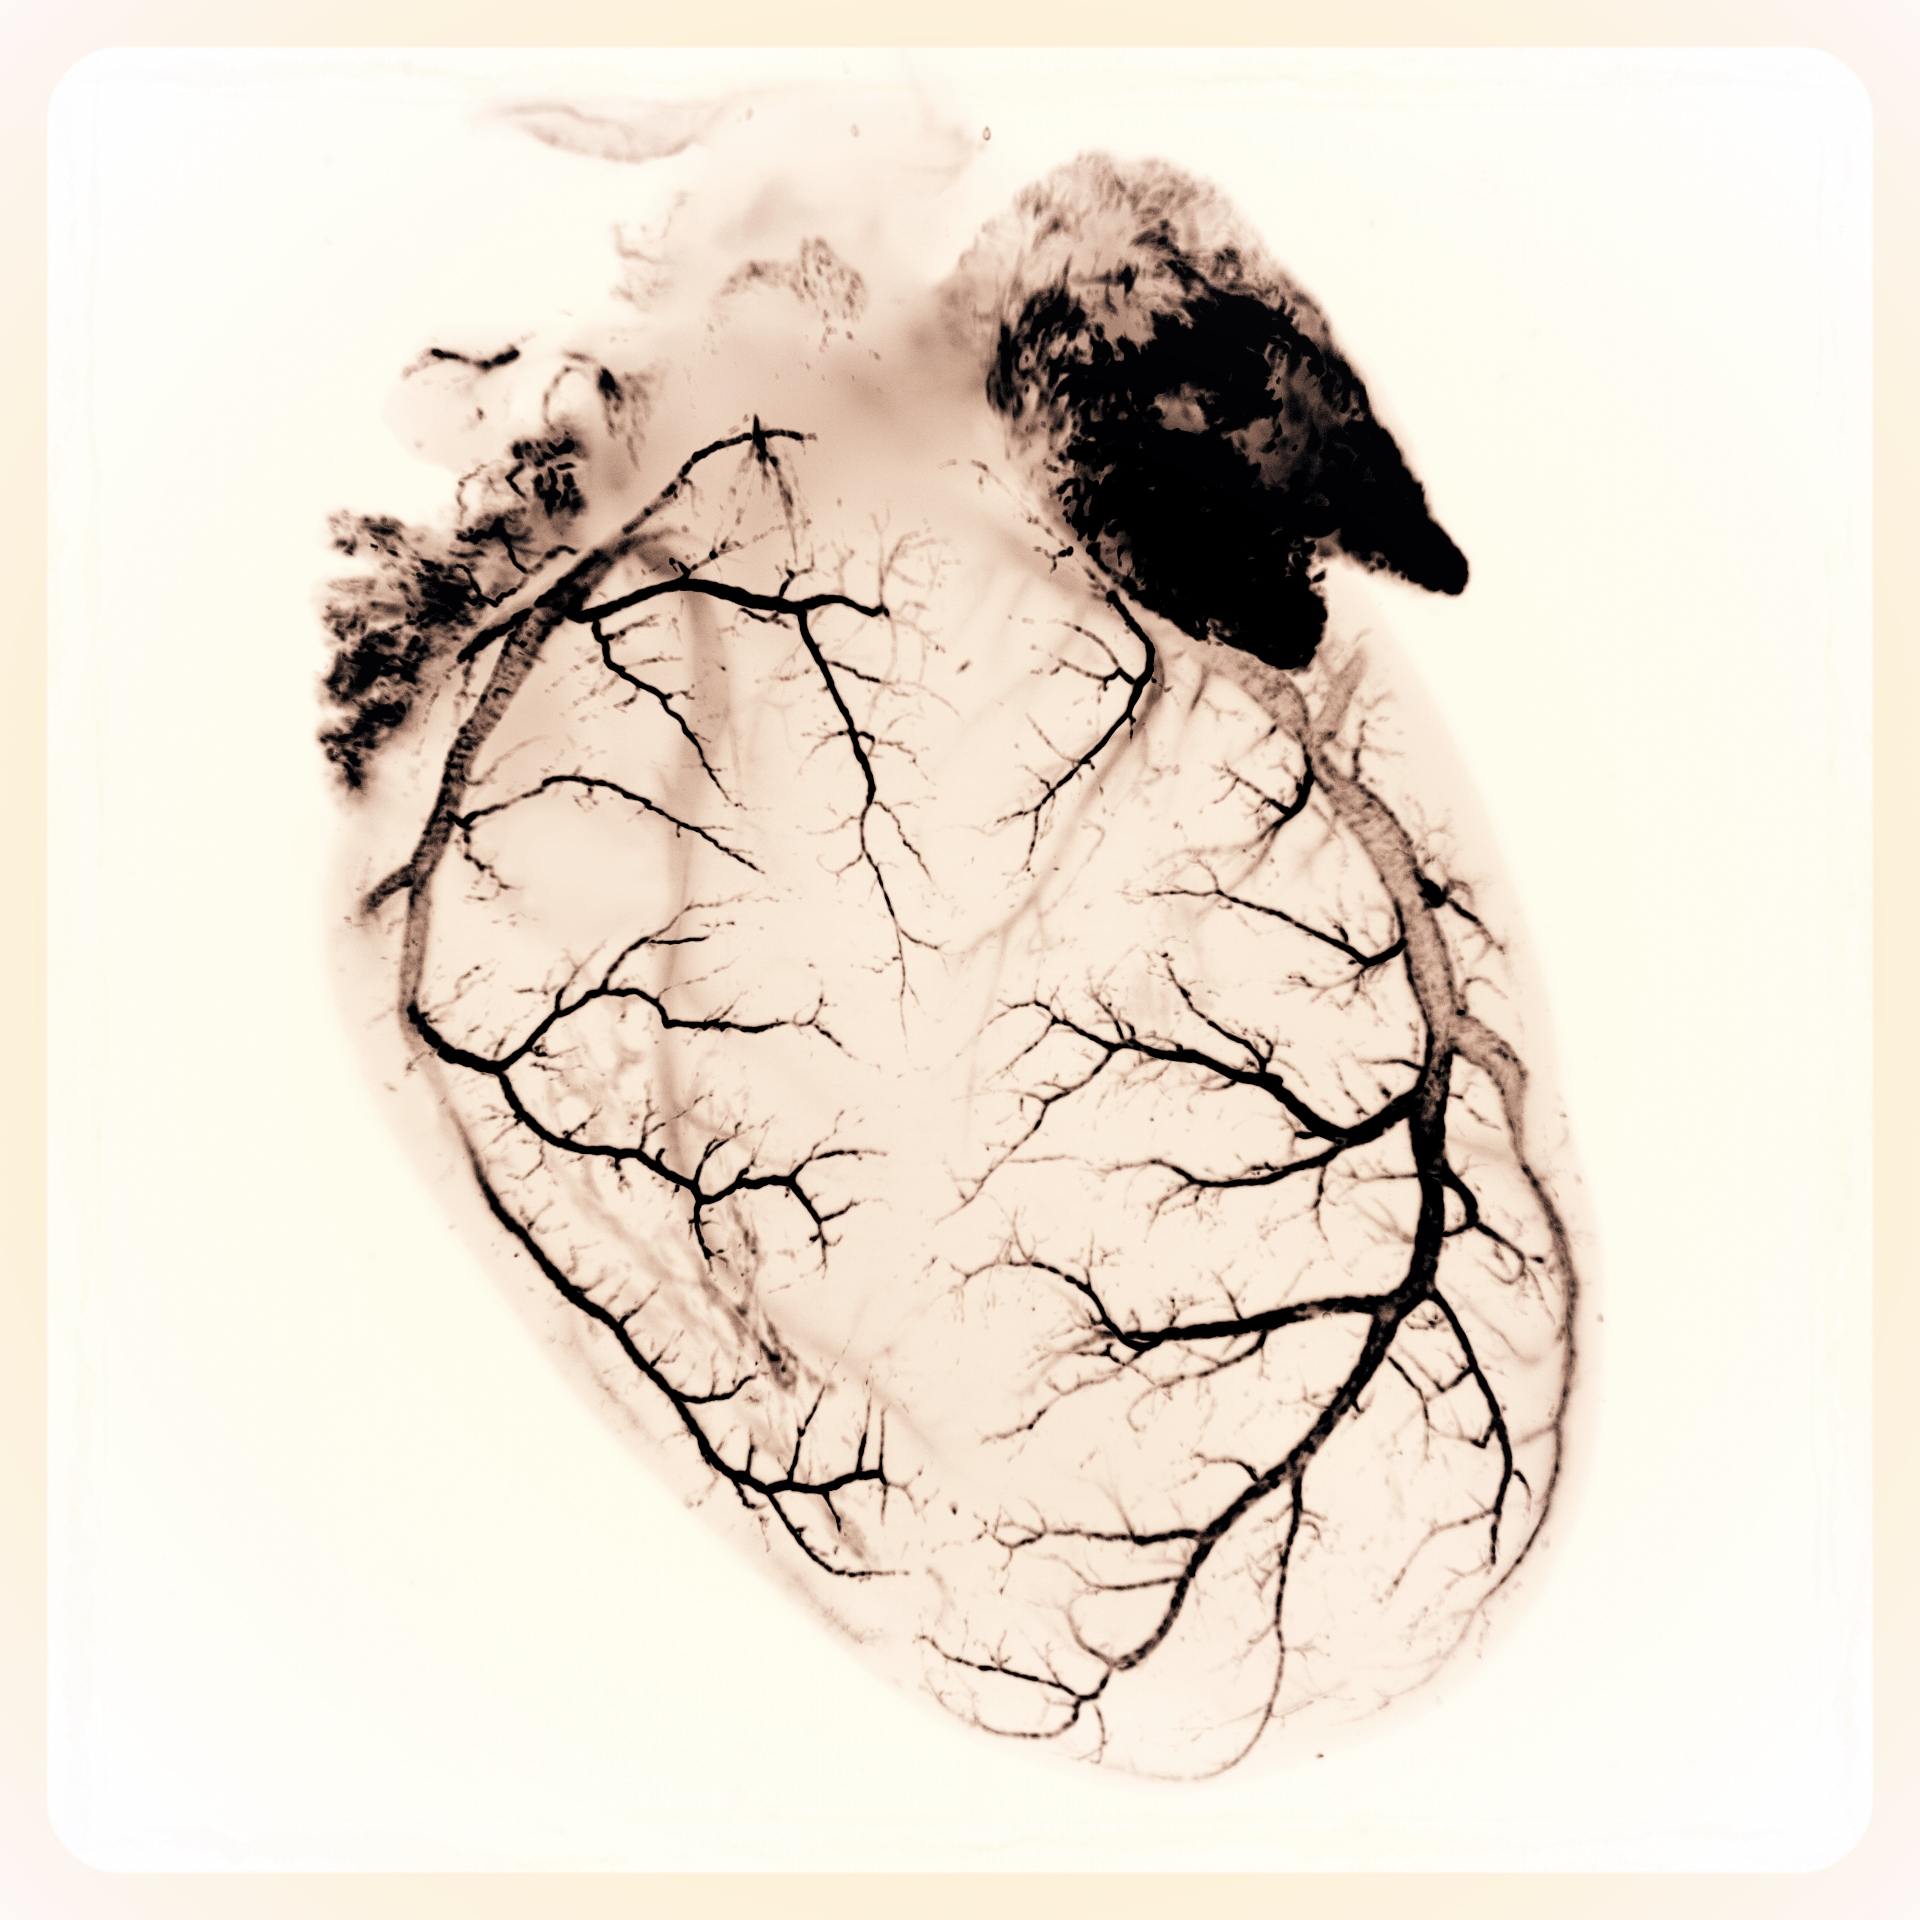 Lightsheet heart invert.jpg